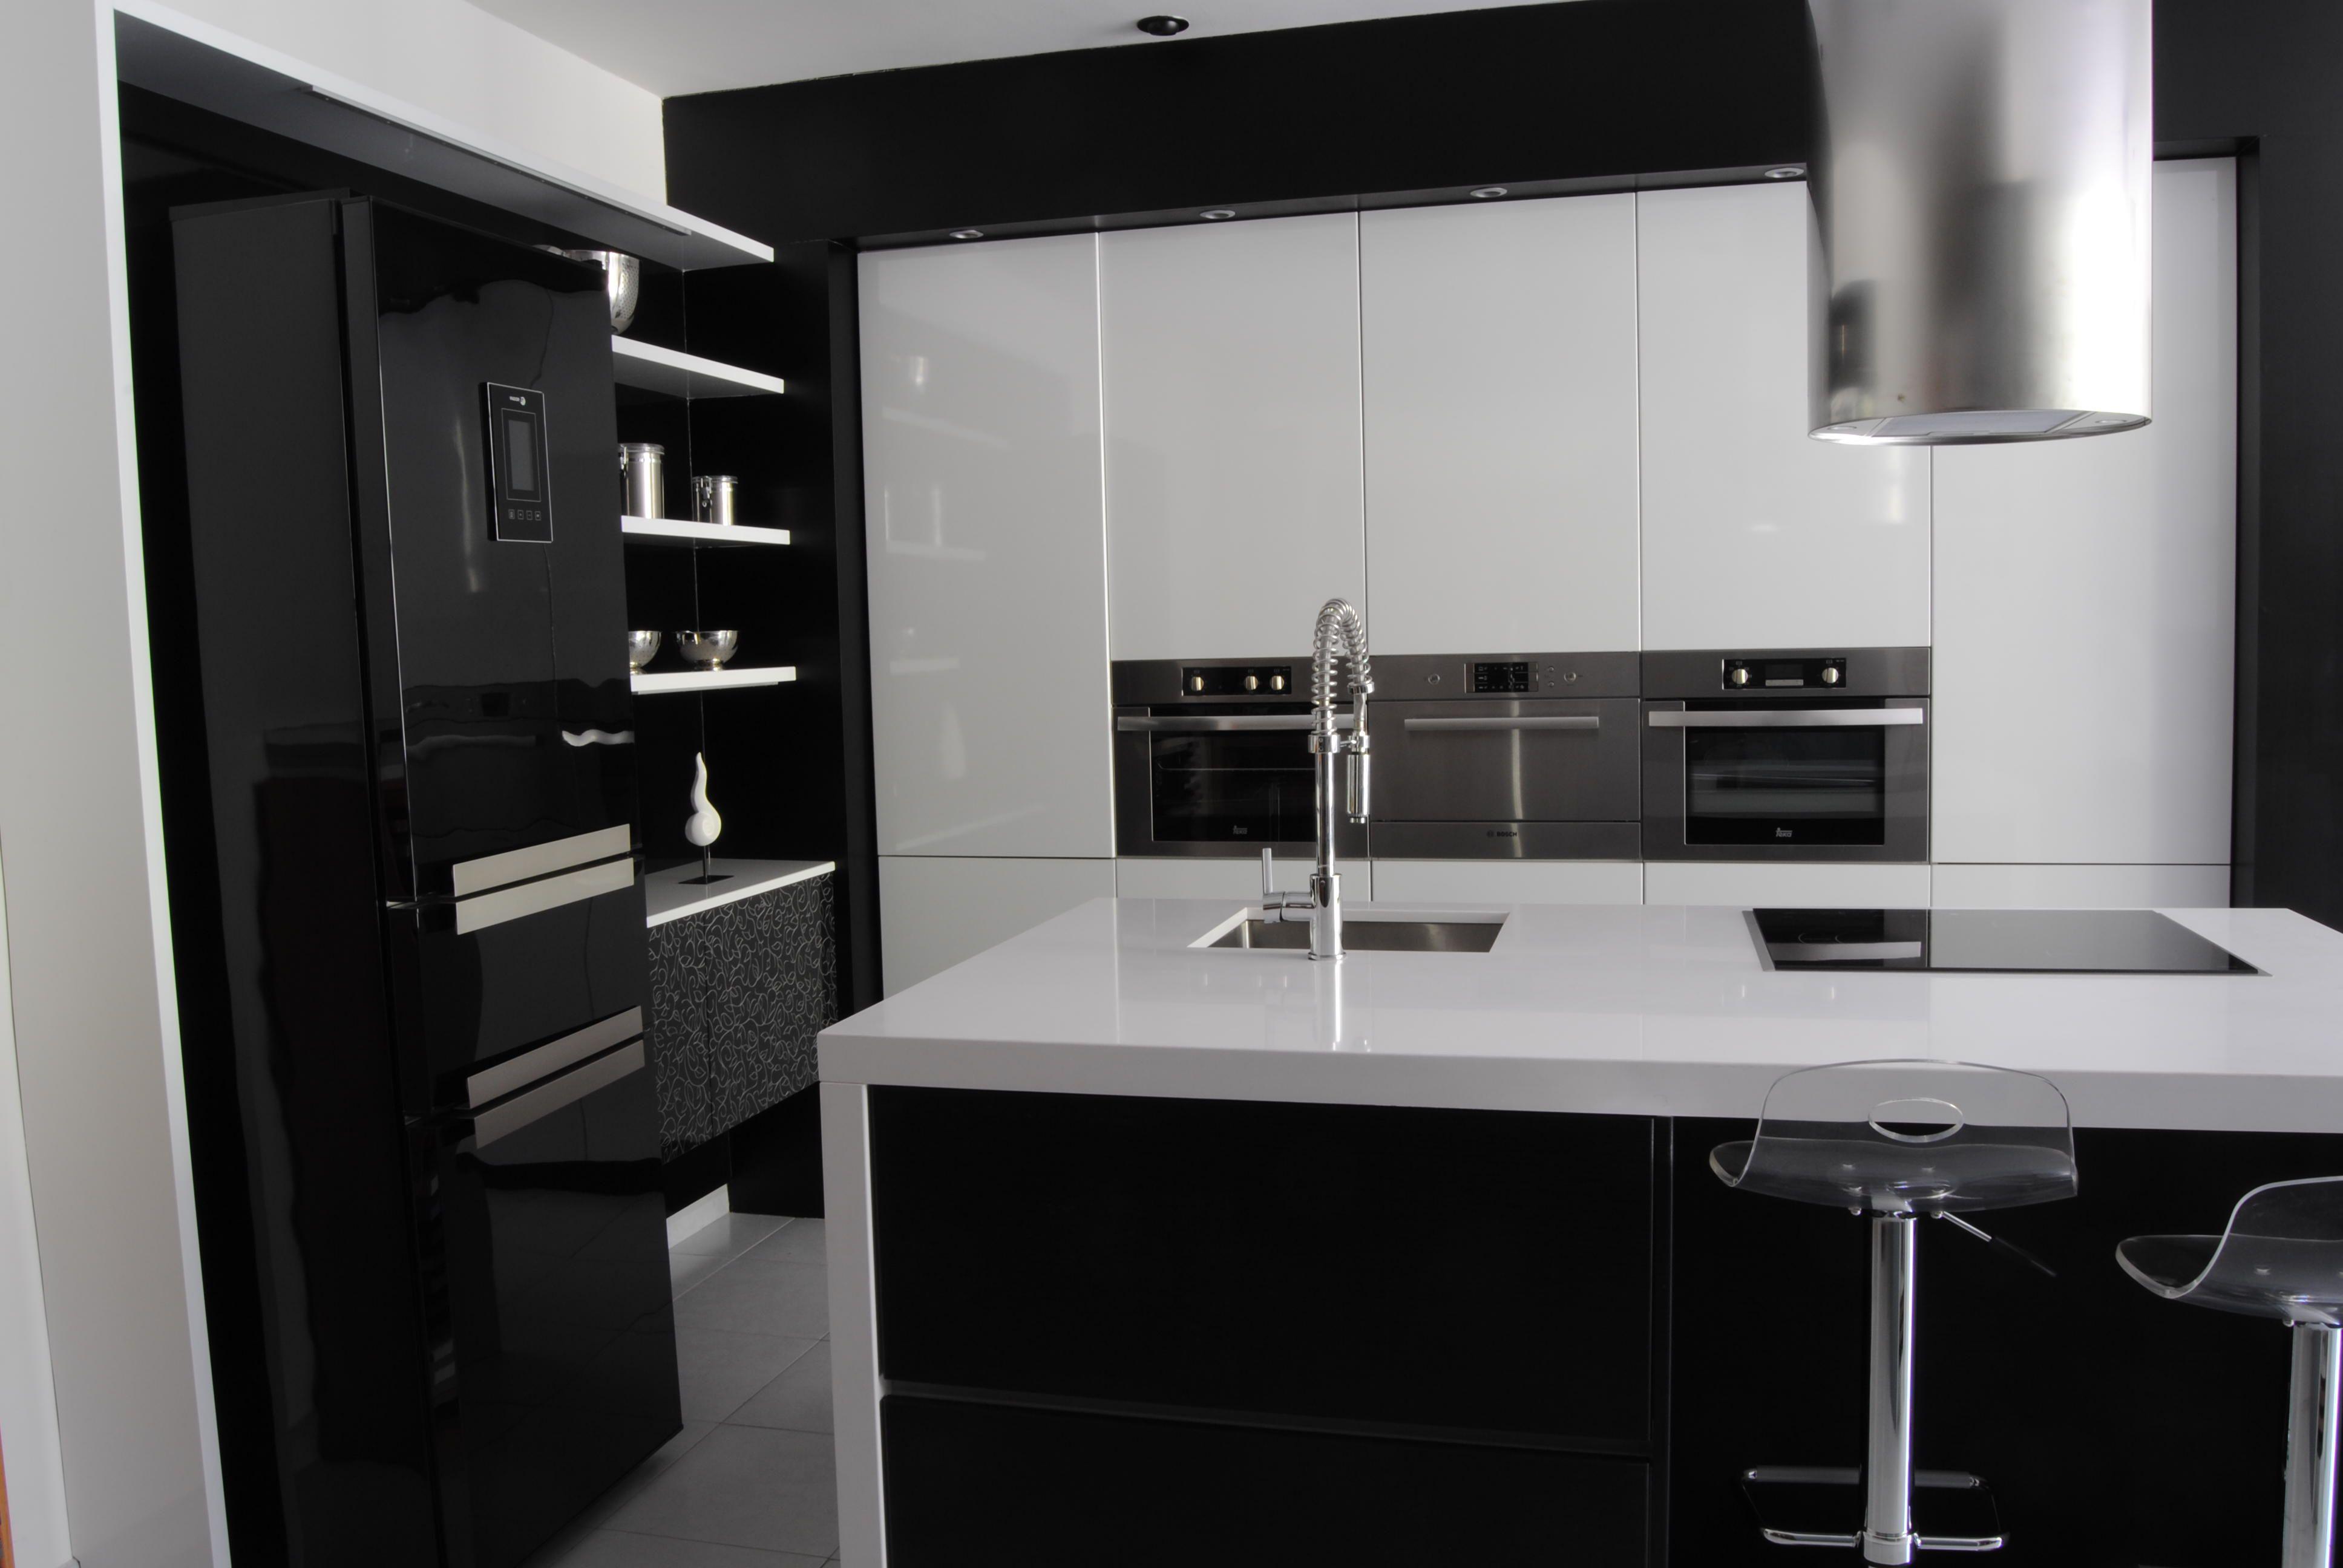 The singular kitchen dise a tu cocina casa dise o casa dise o - Kitchen sukaldeak ...